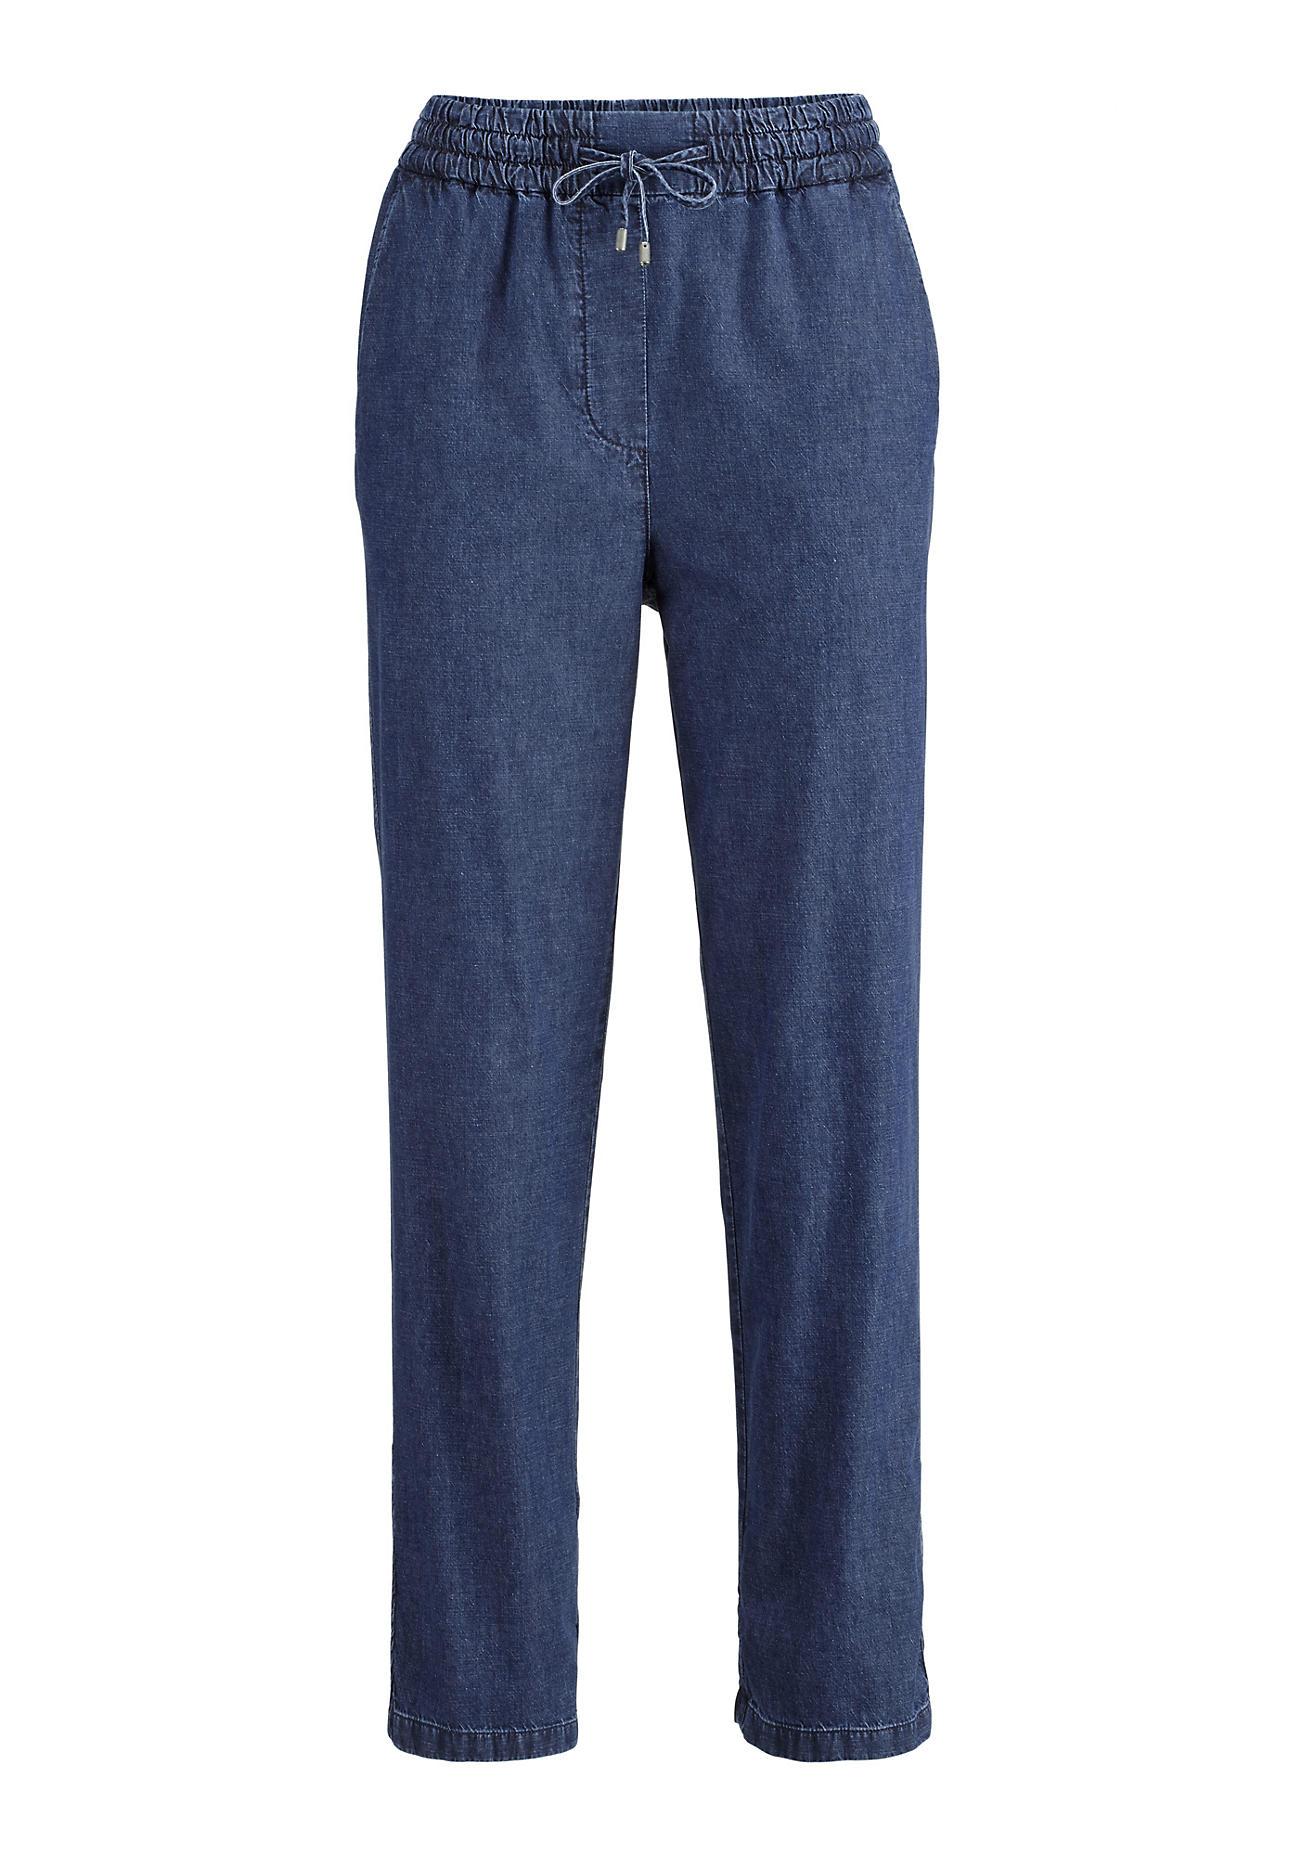 Hosen - hessnatur Damen Jeans Joggpants aus Bio Baumwolle mit Leinen – blau –  - Onlineshop Hessnatur